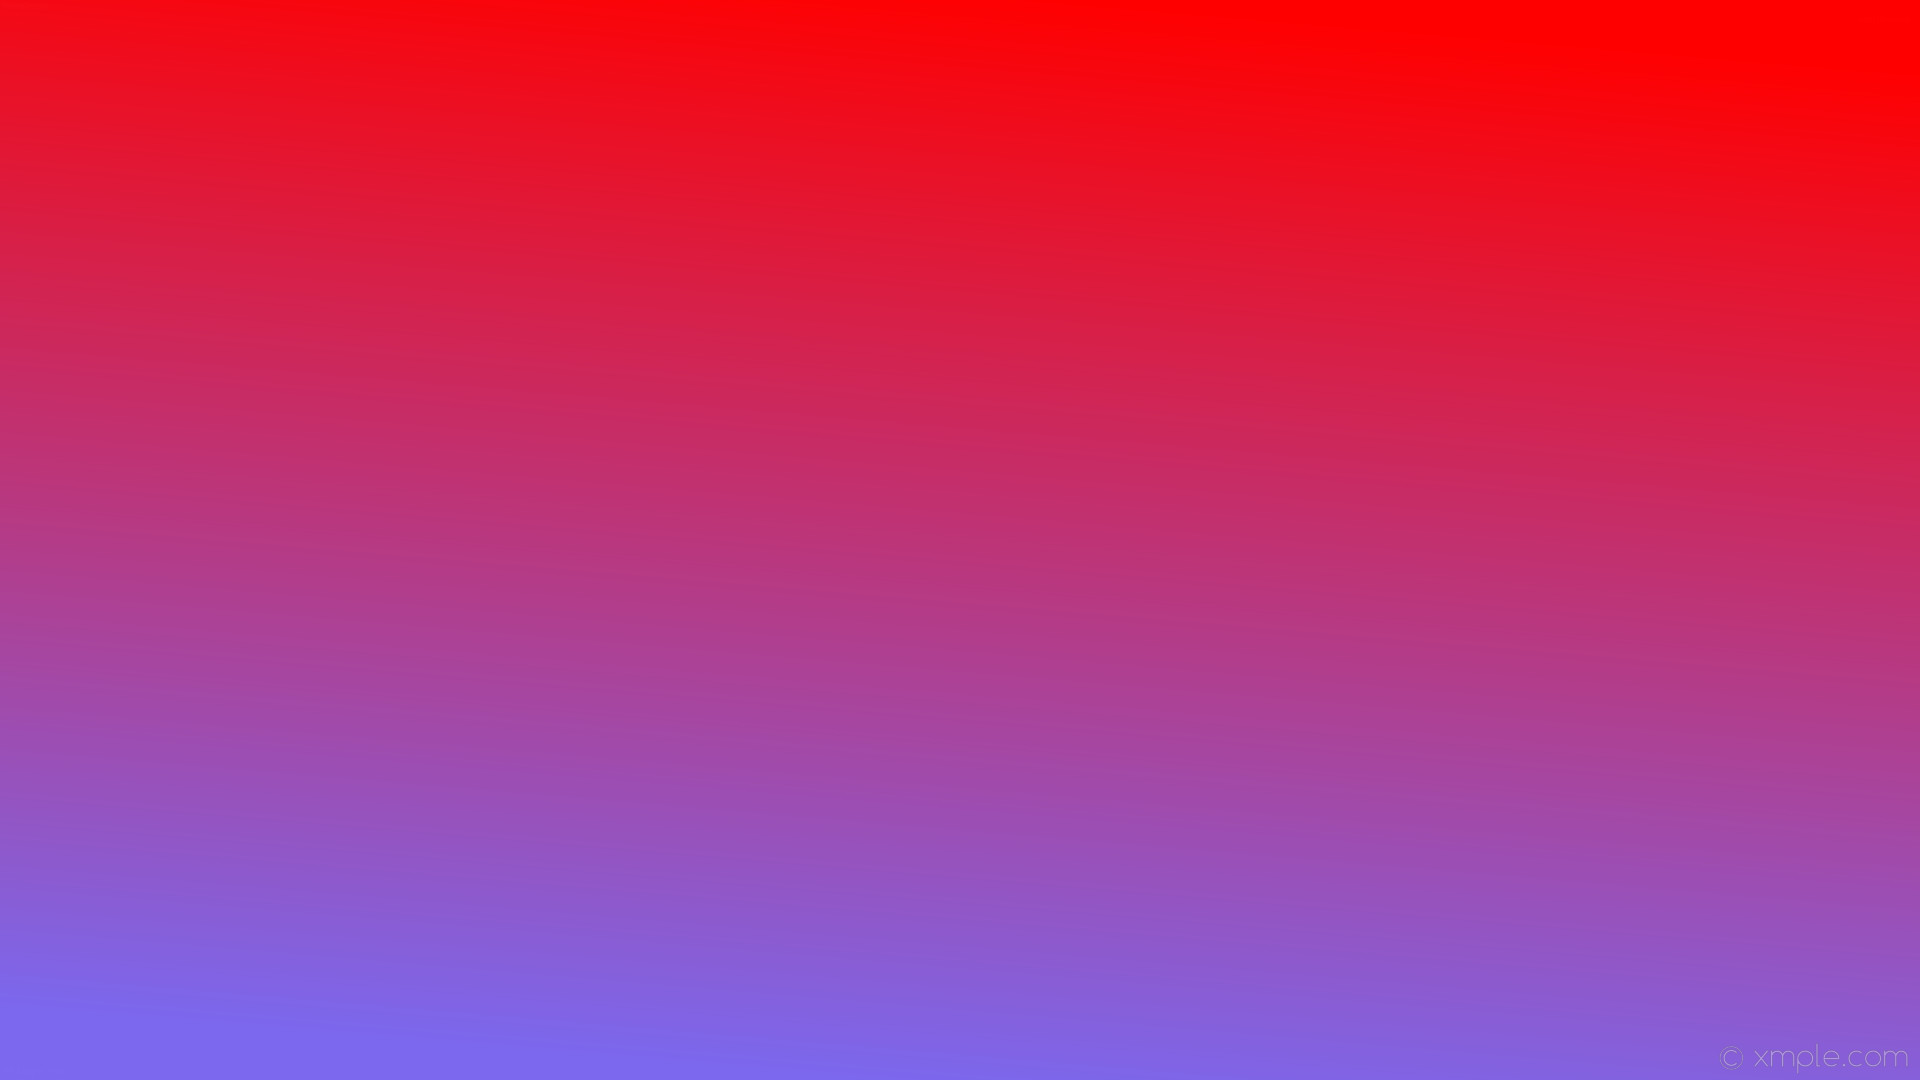 wallpaper red purple gradient linear medium slate blue #7b68ee #ff0000 255°